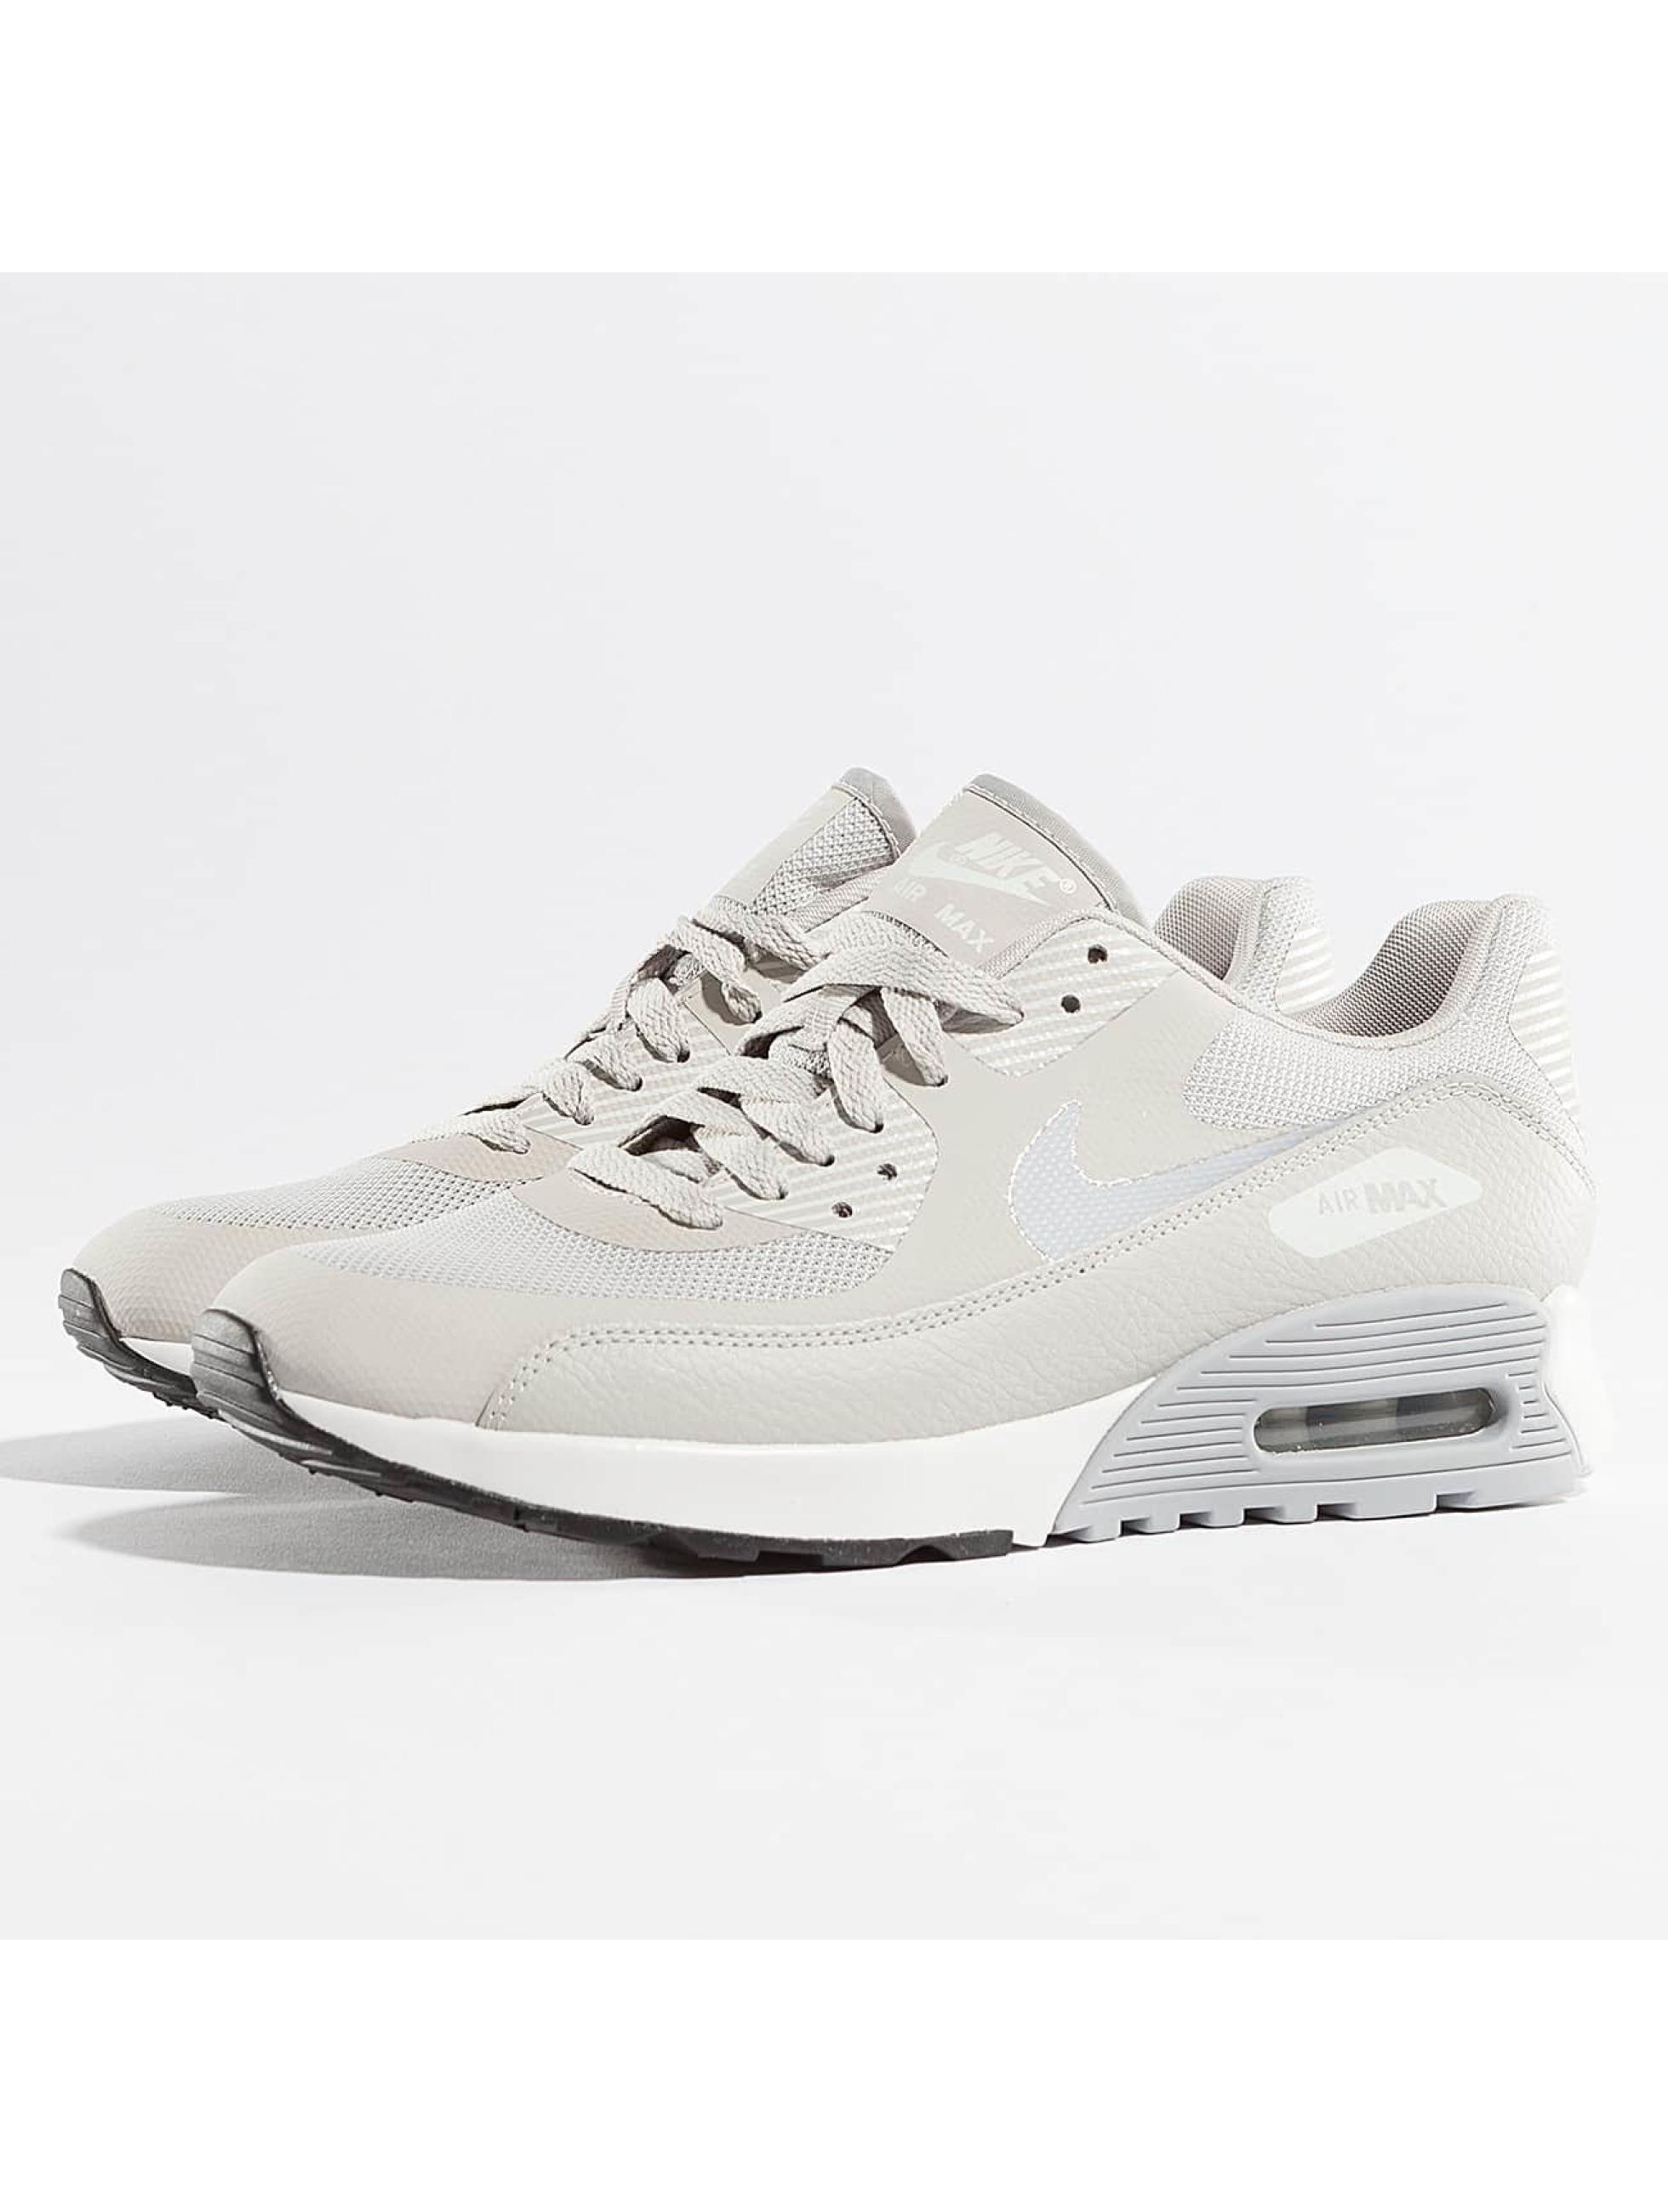 new product 832b3 fb3de ... spain nike frauen sneaker w air max 90 ultra 2.0 in grau 4e4b0 09d80